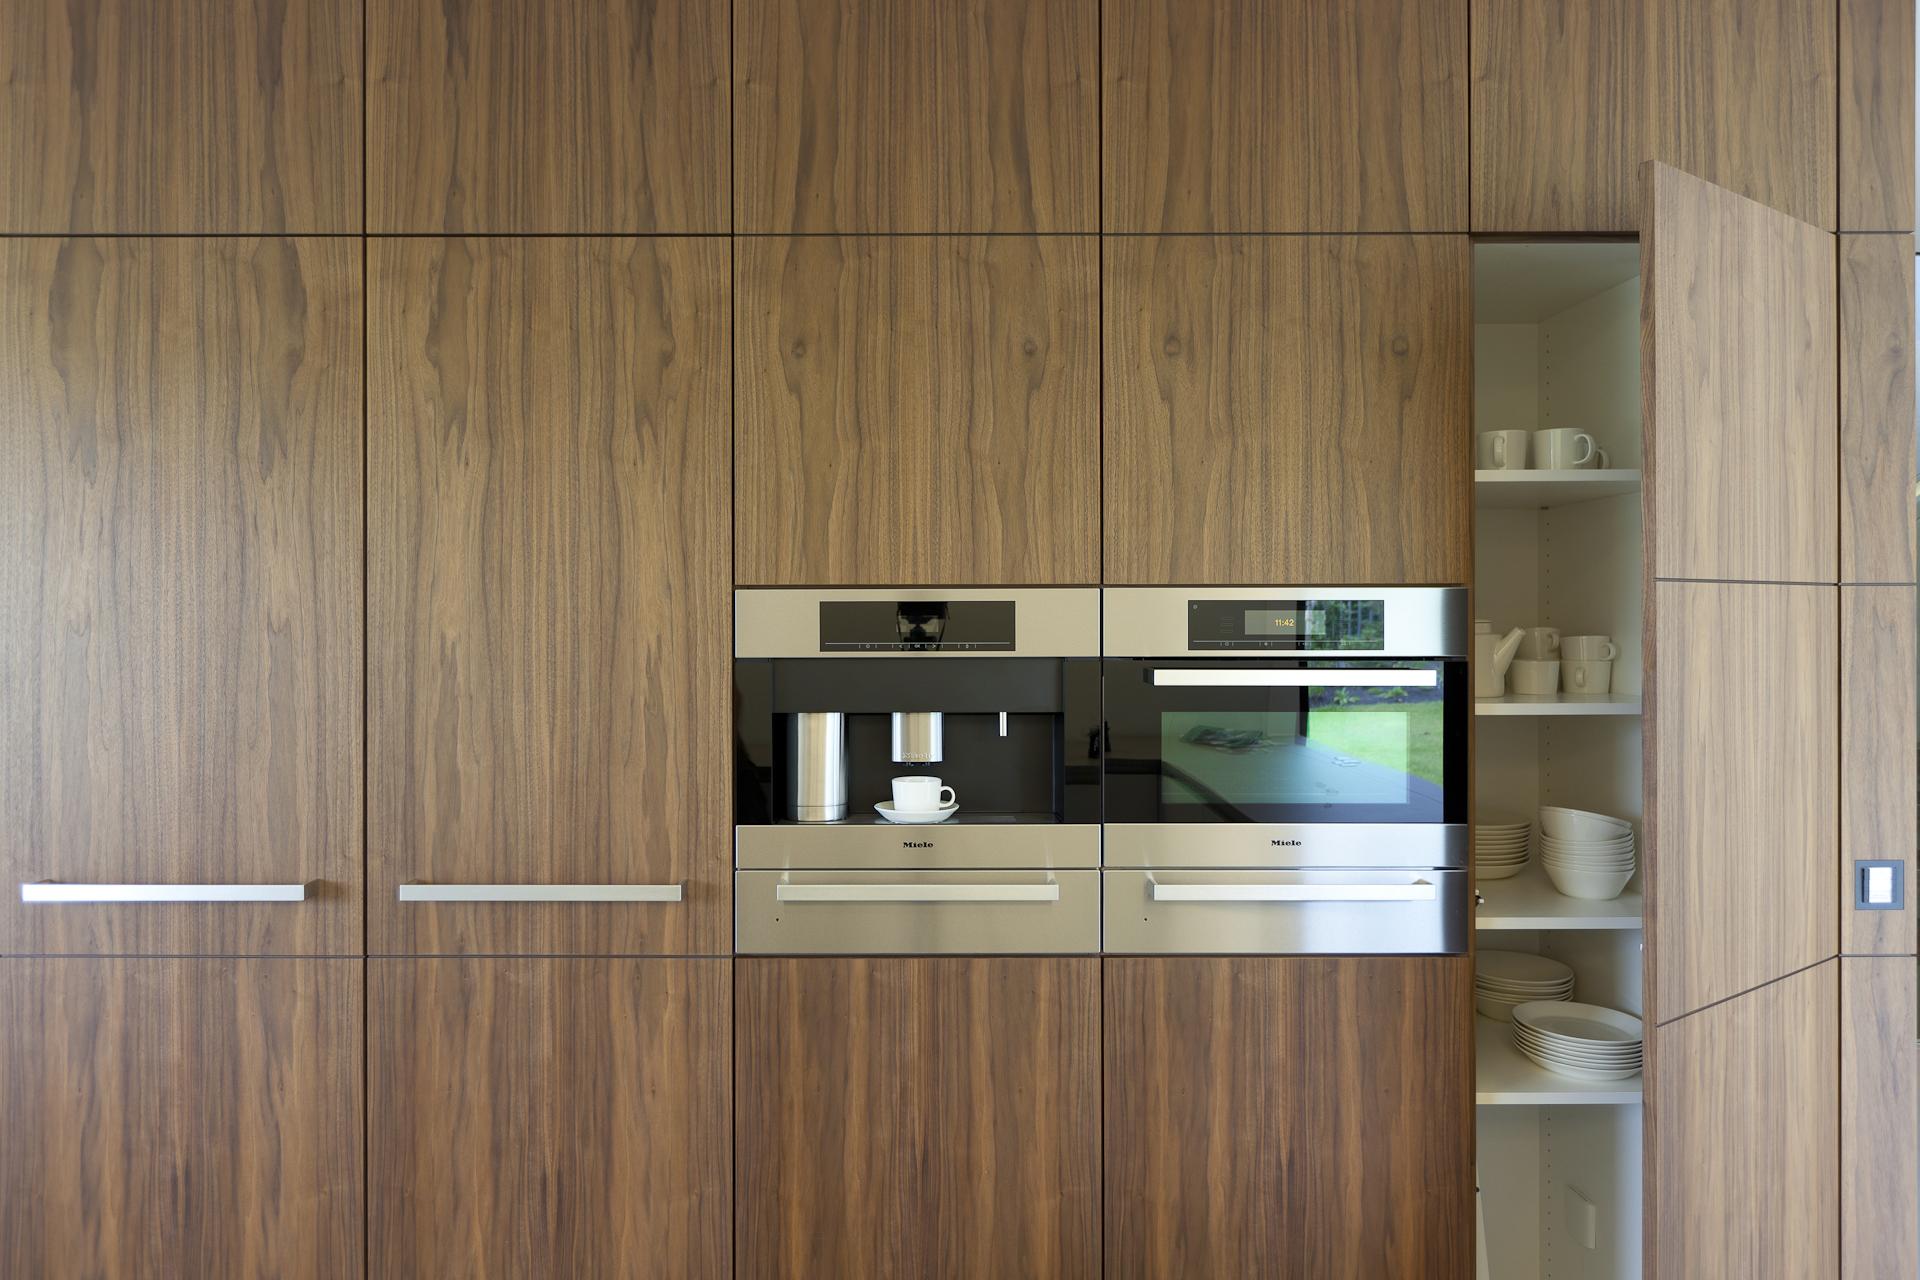 Peter_Leenders_Fotografie_Wrede_Architekten-9